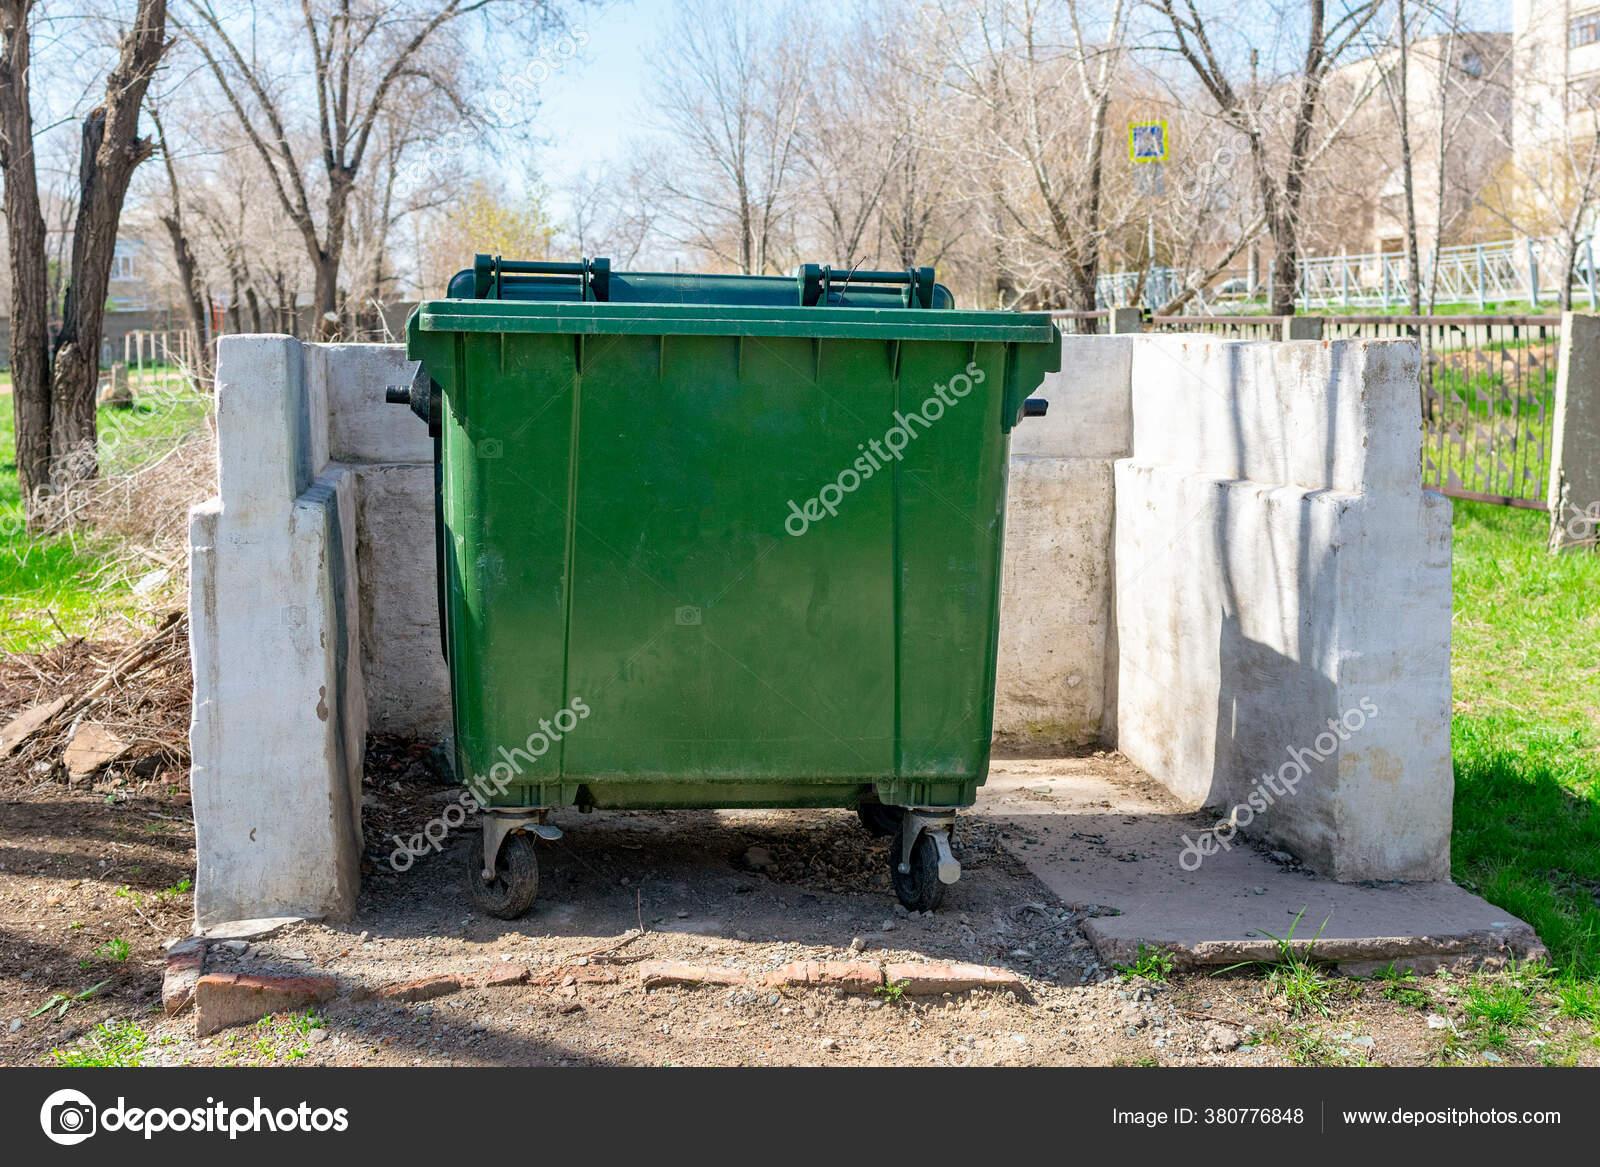 Green Trash Can Wheels Stands Site White Concrete Fence Public Stock Photo C Ksu Ksv 380776848